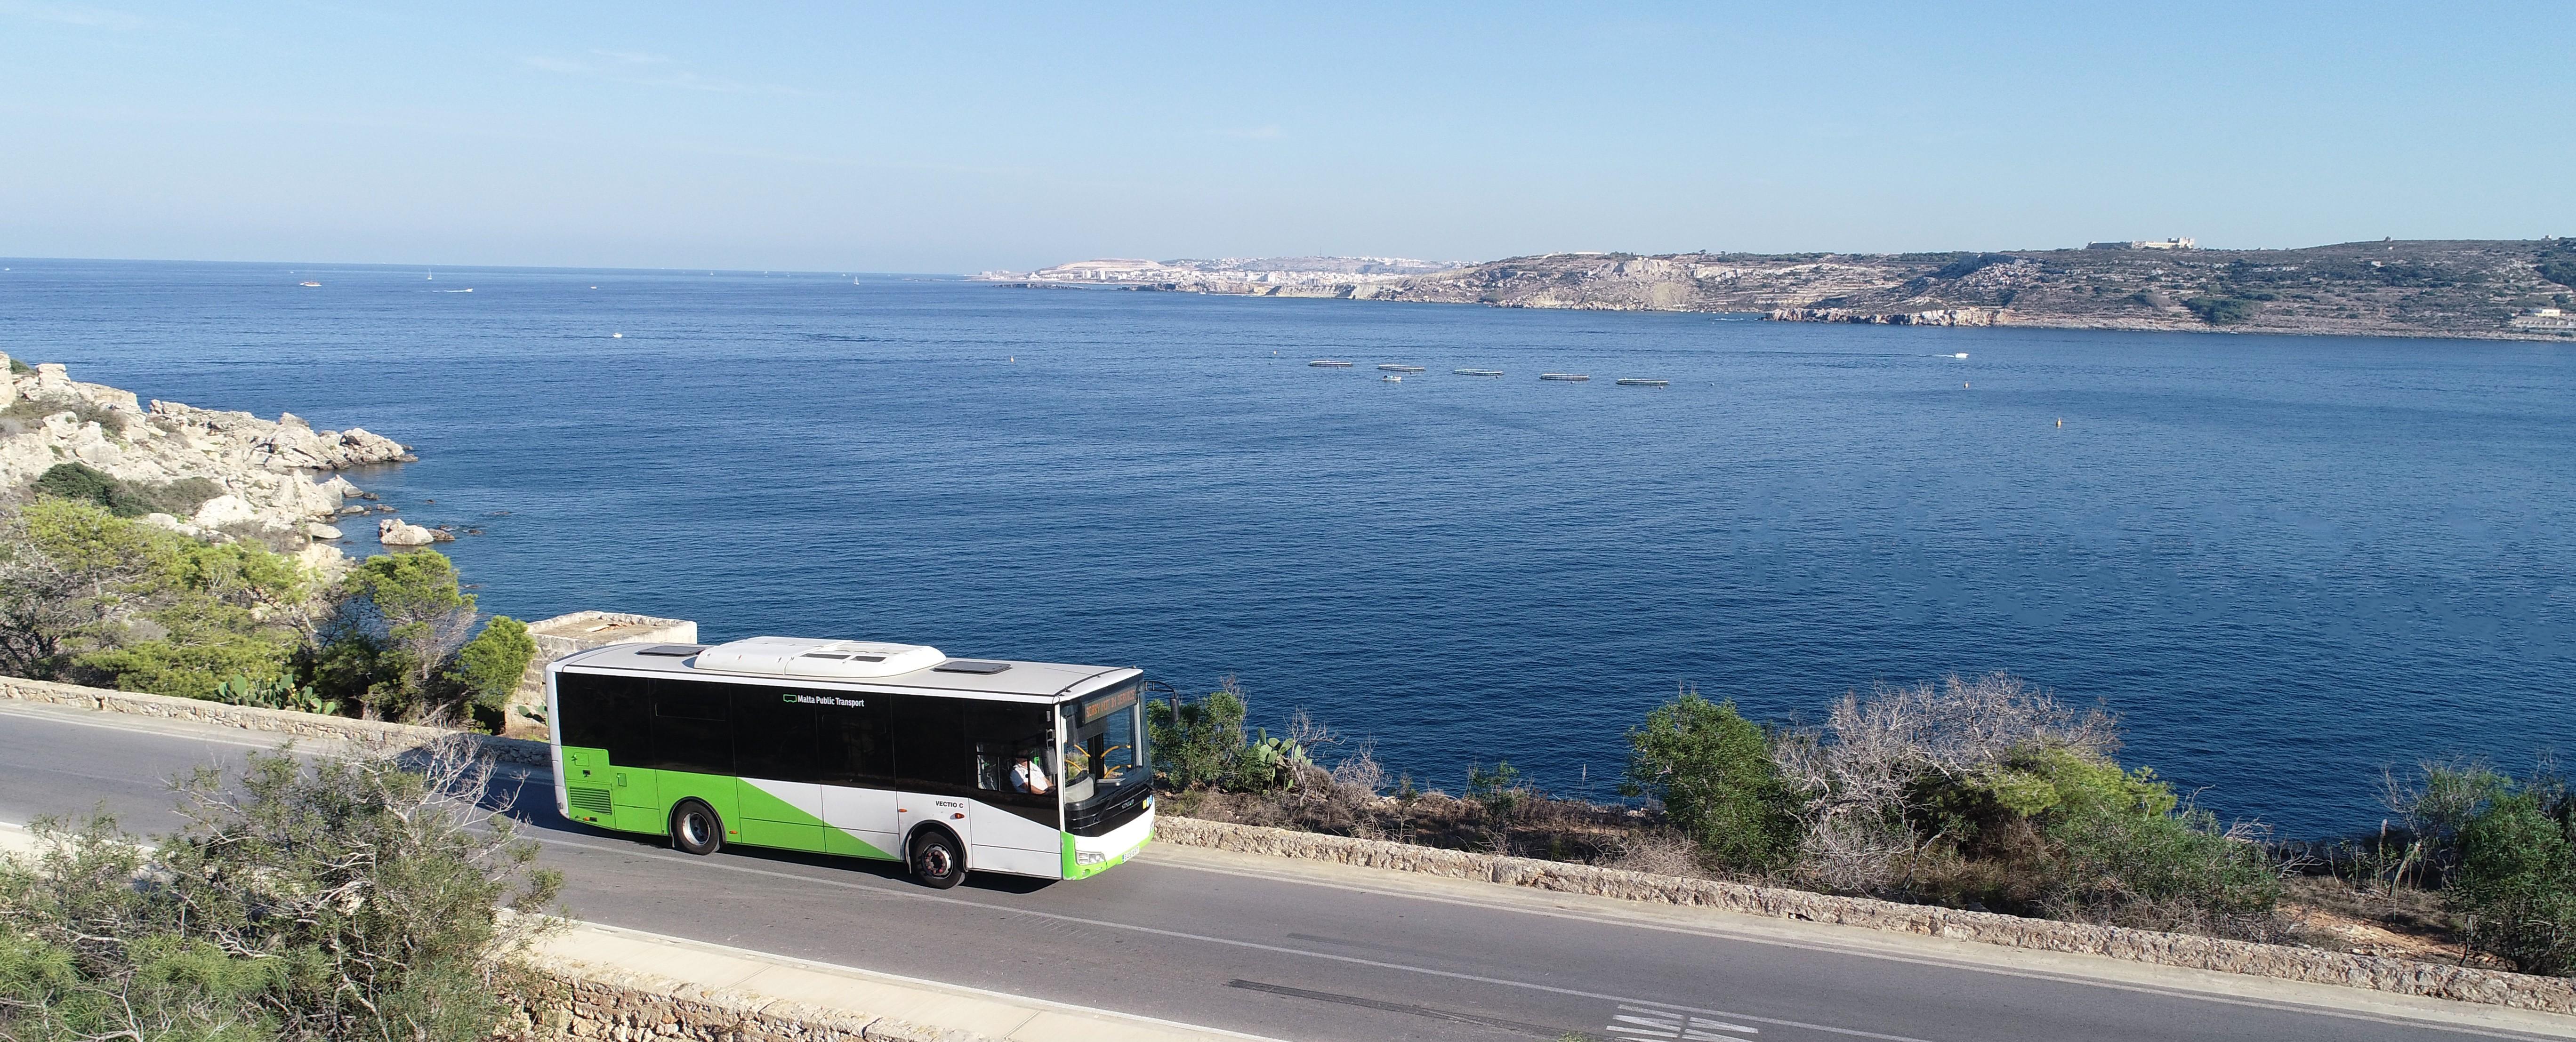 Malta Public Transport   LinkedIn